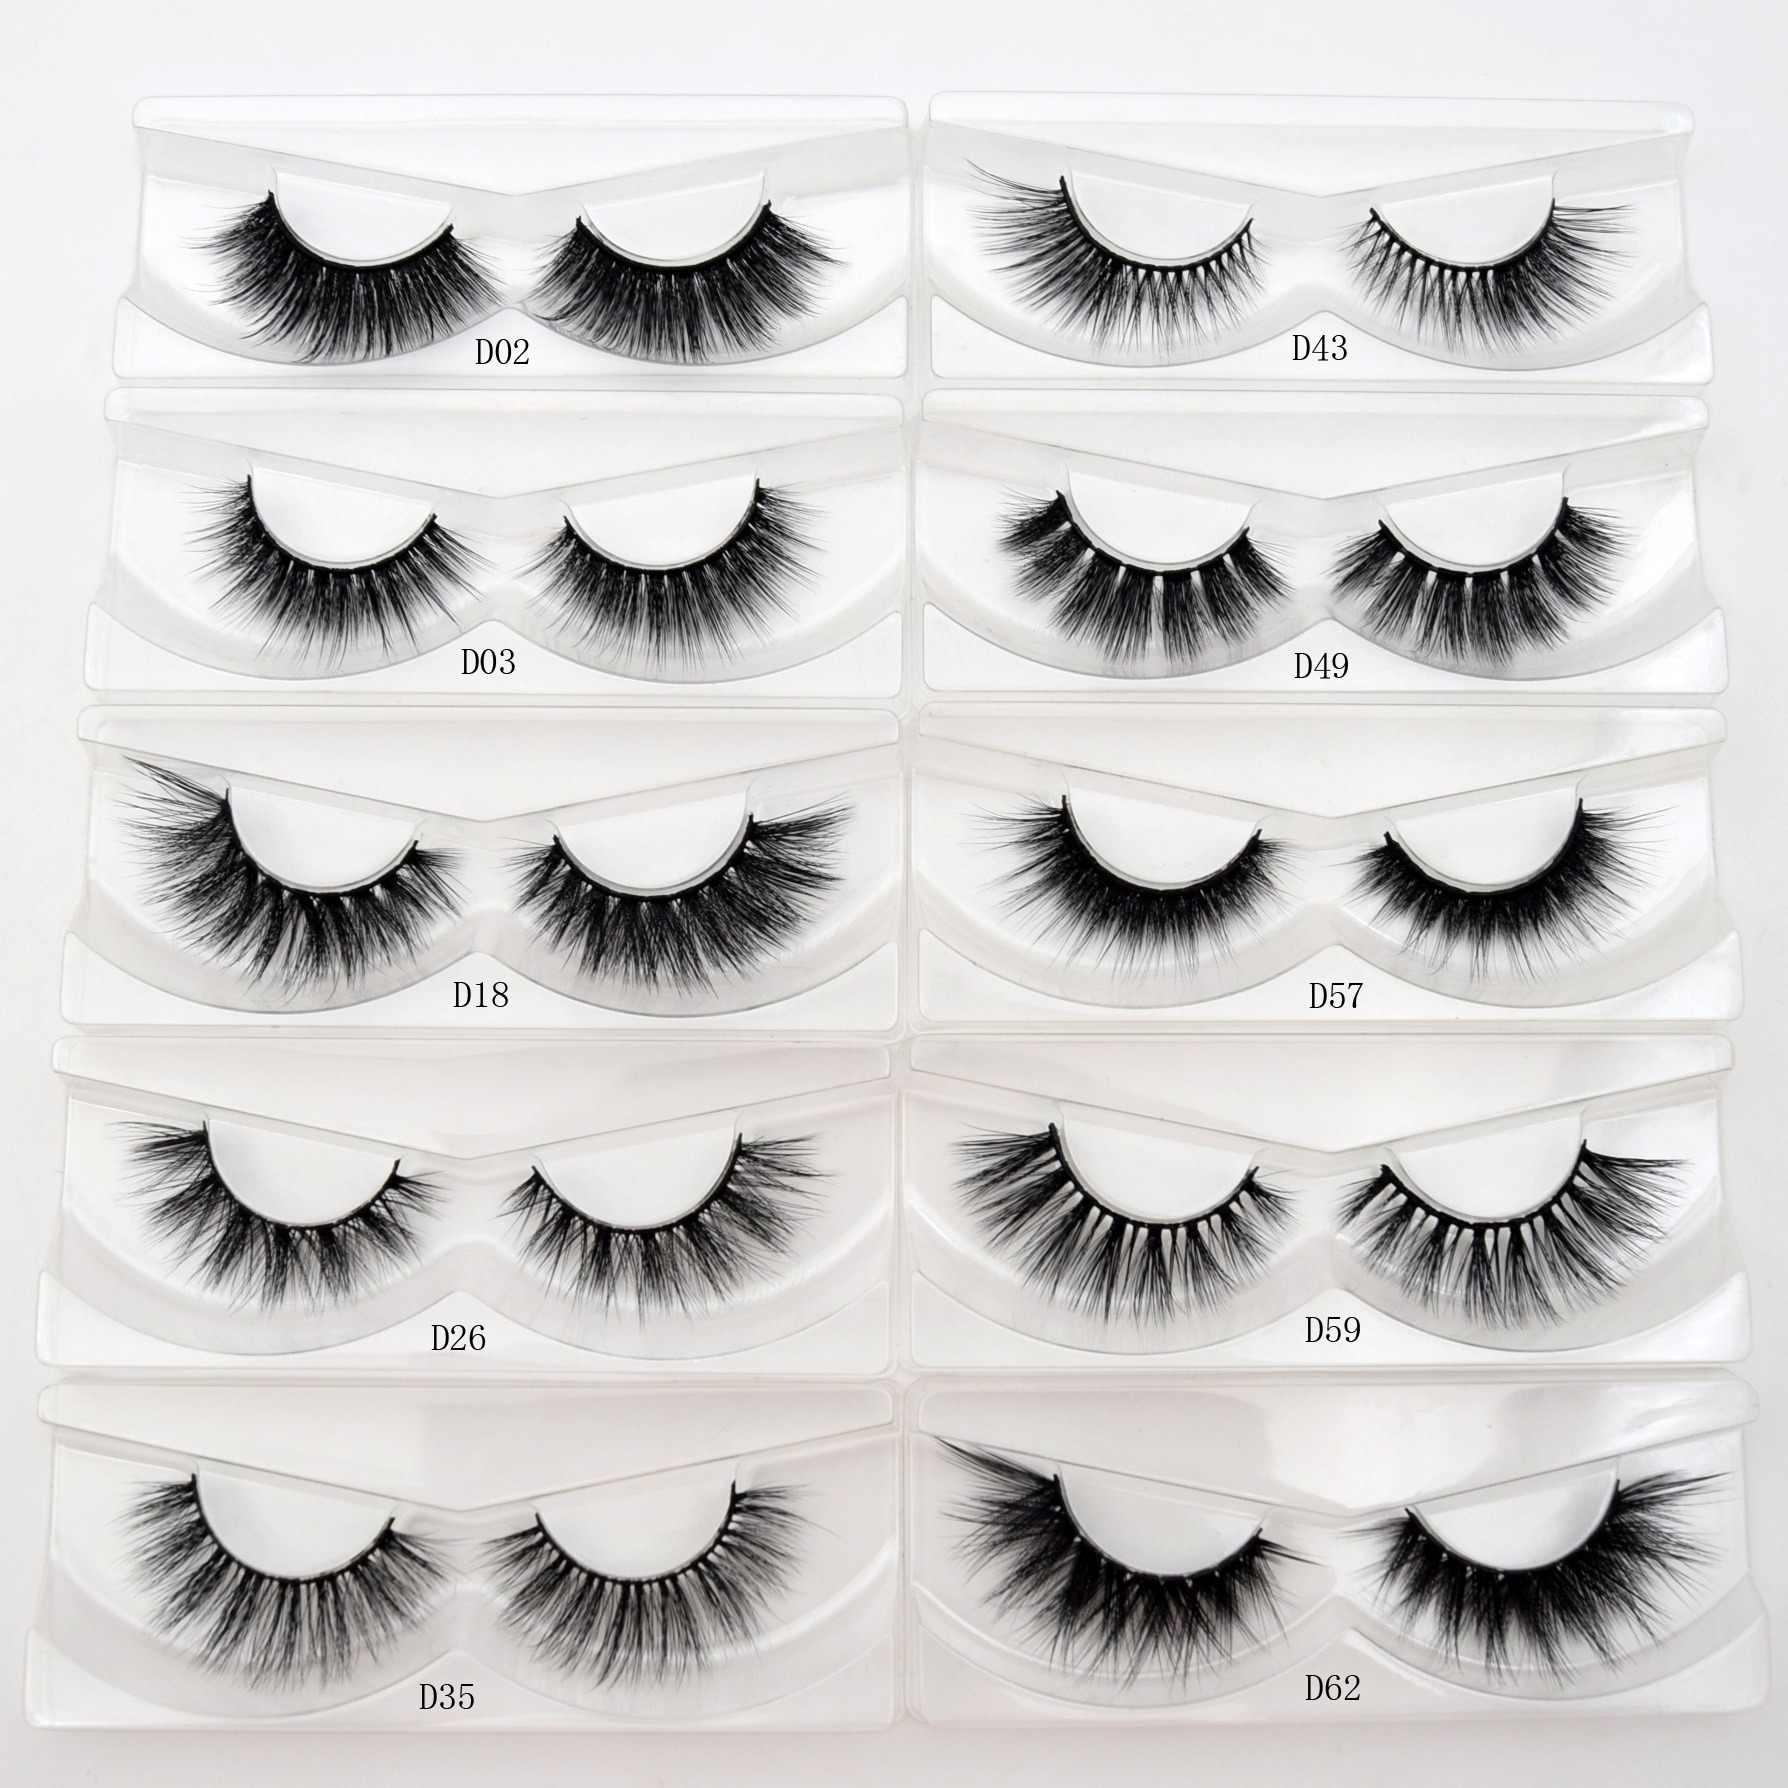 e2f5d070c5c visofree cilios mink eyelashes makeup false eyelashes handmade natural full  volume lashes 3D faux cils mink